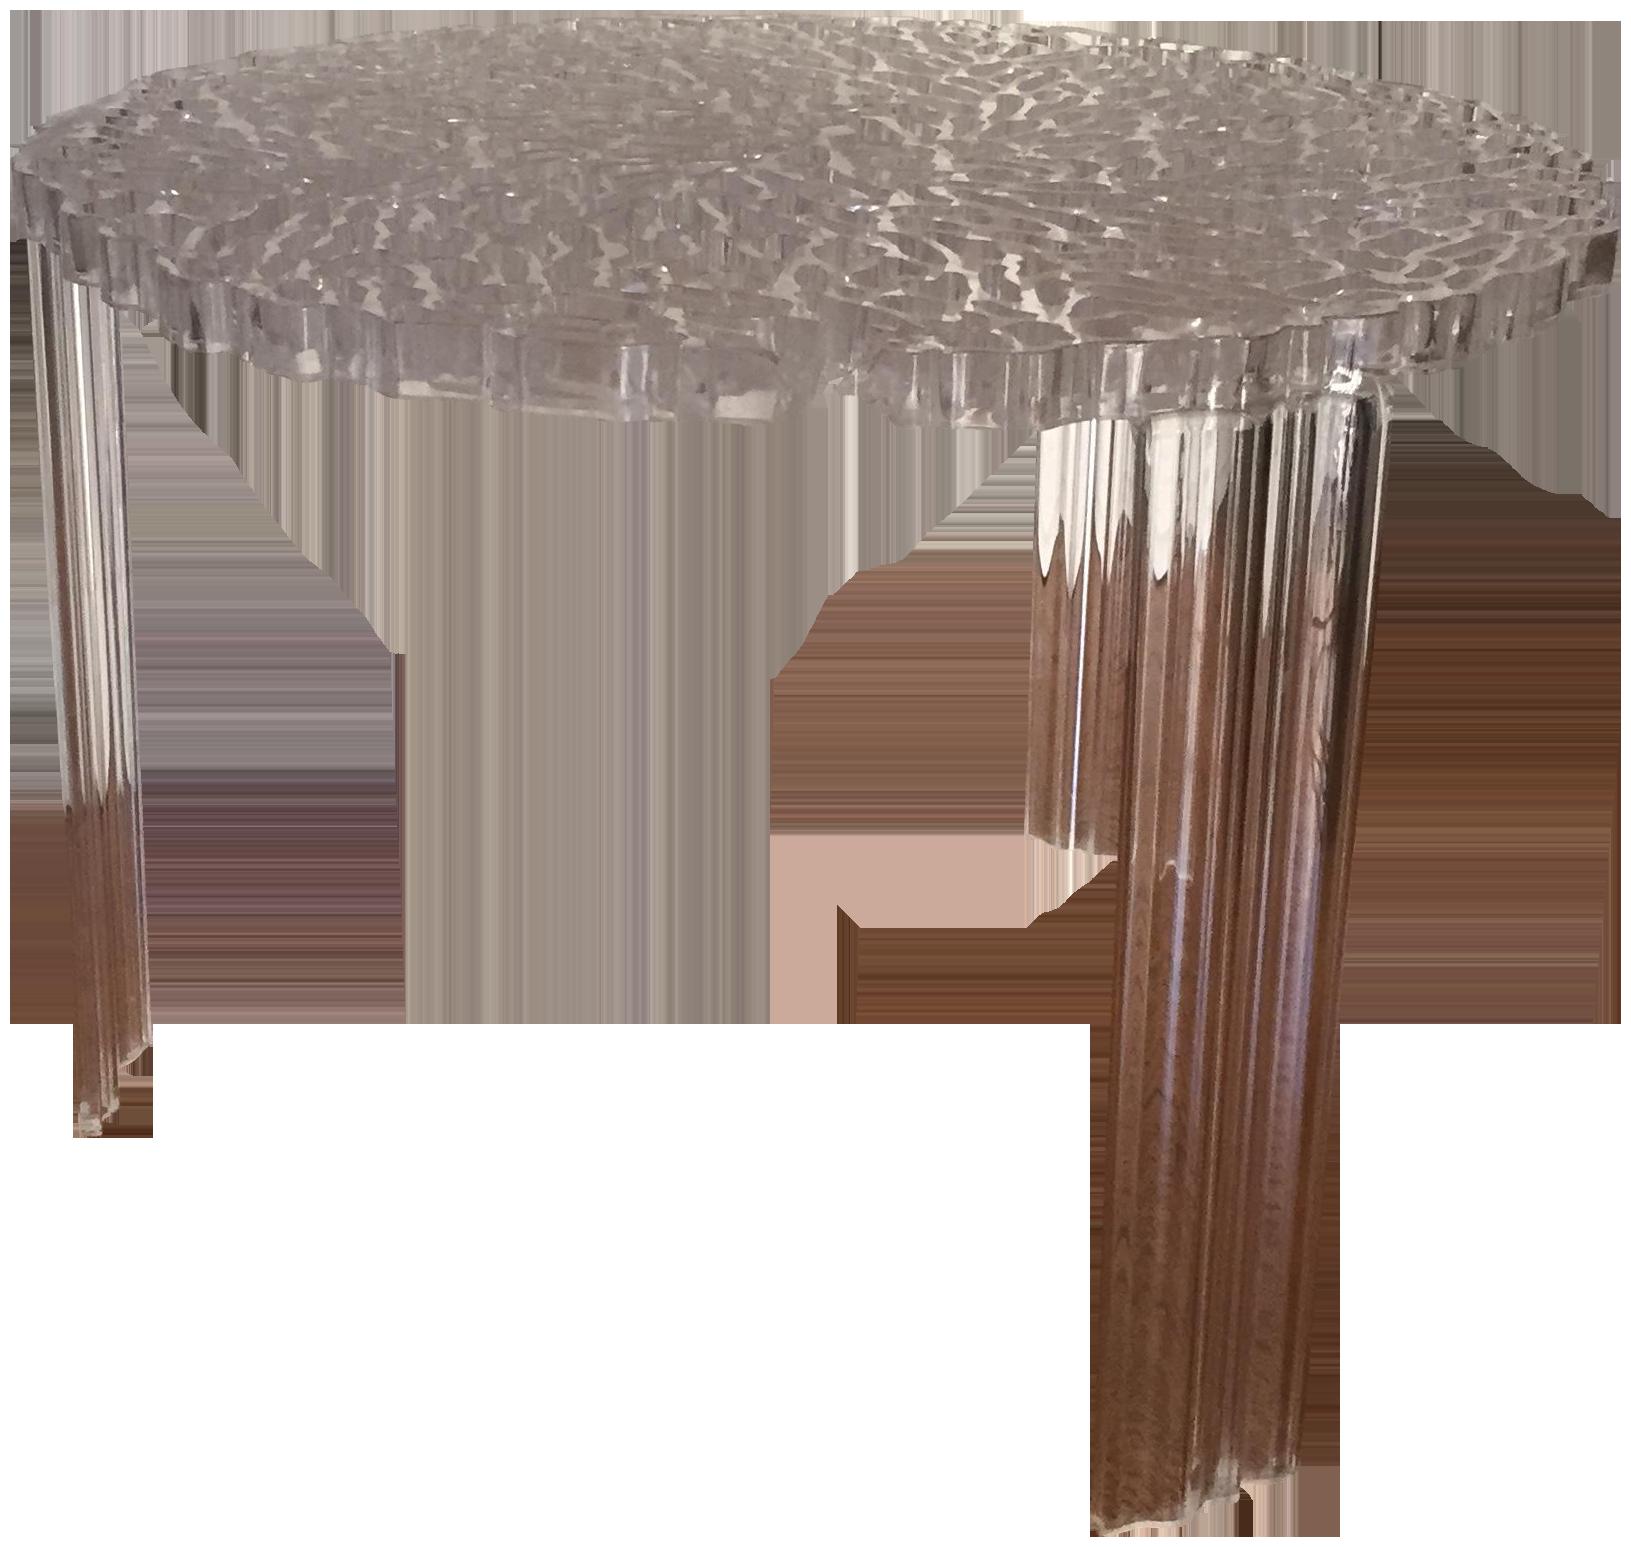 Kartell Patricia Urquiola TTable Side Table  Chairish -> T Table Kartell